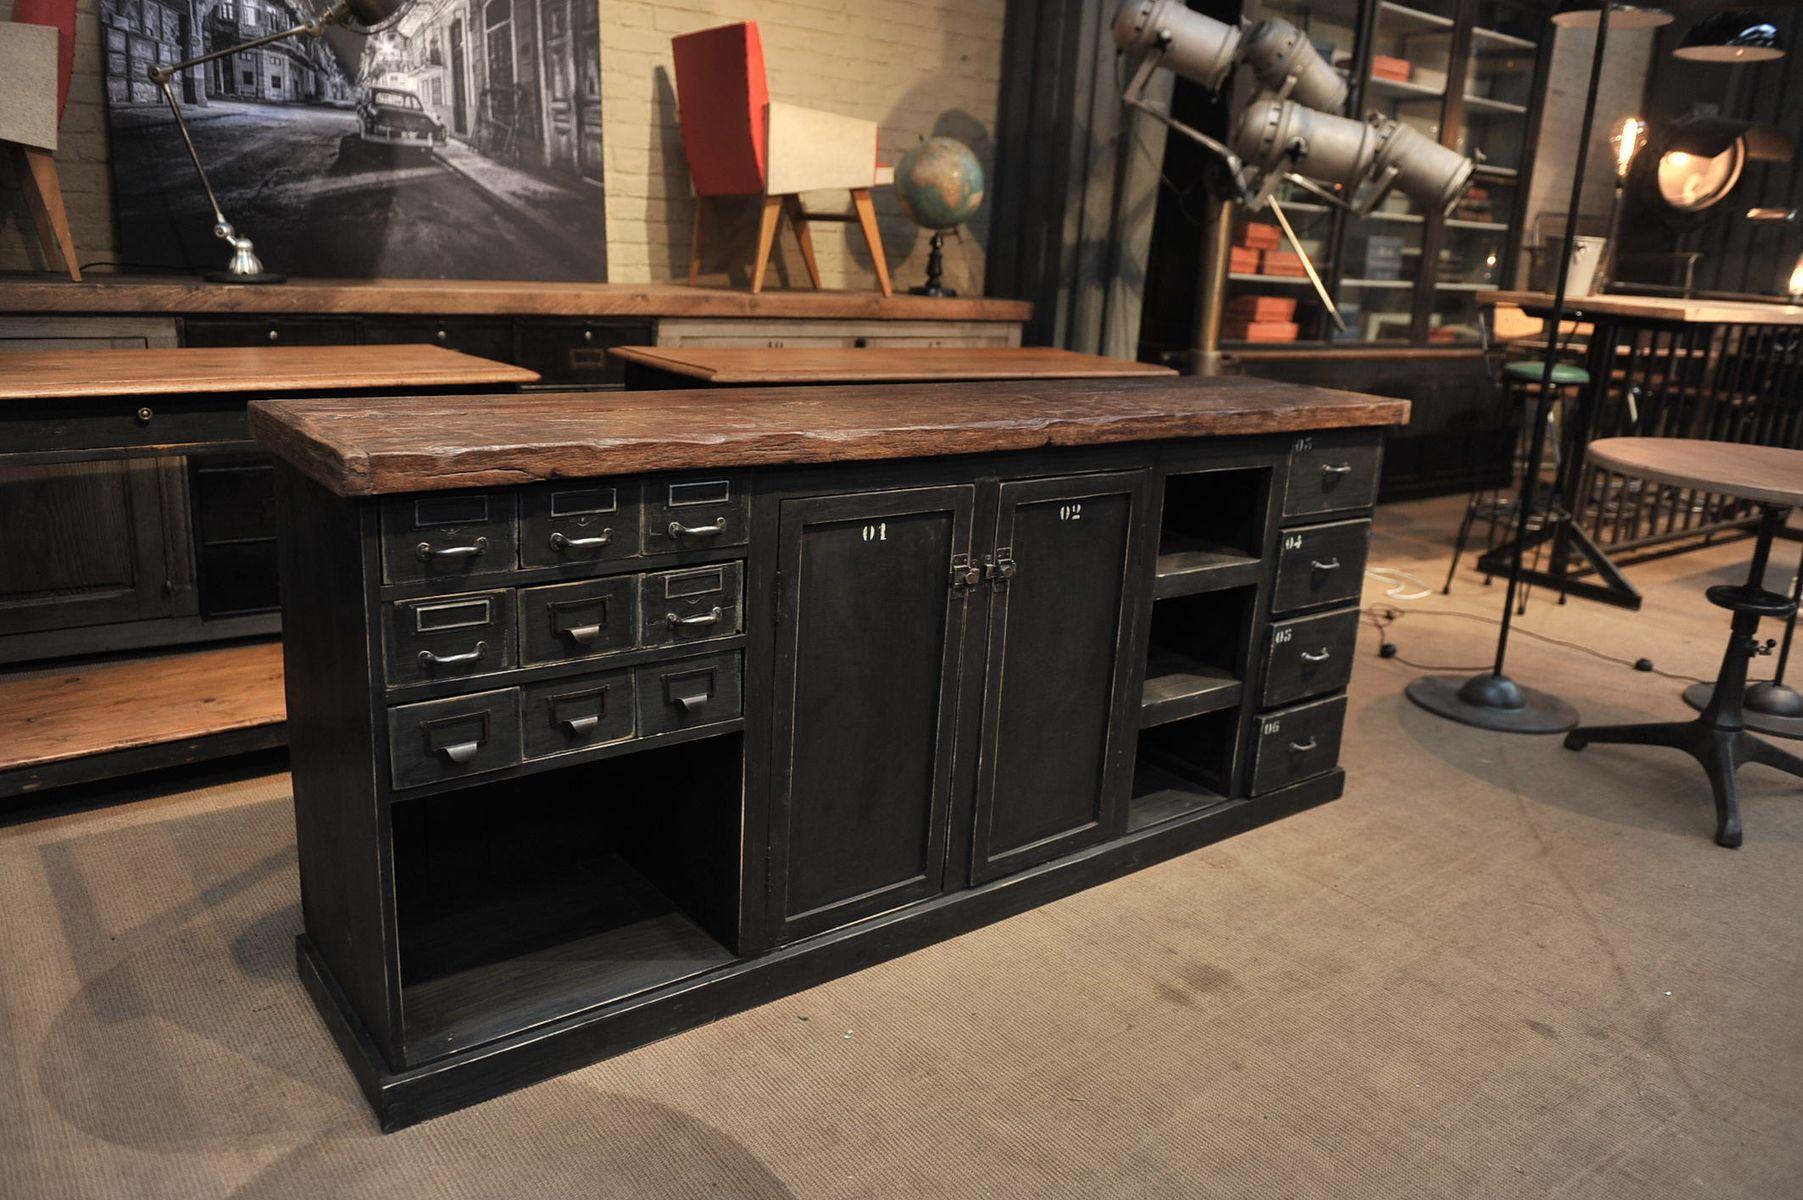 comptoir de magasin industriel france 1950s en vente sur. Black Bedroom Furniture Sets. Home Design Ideas